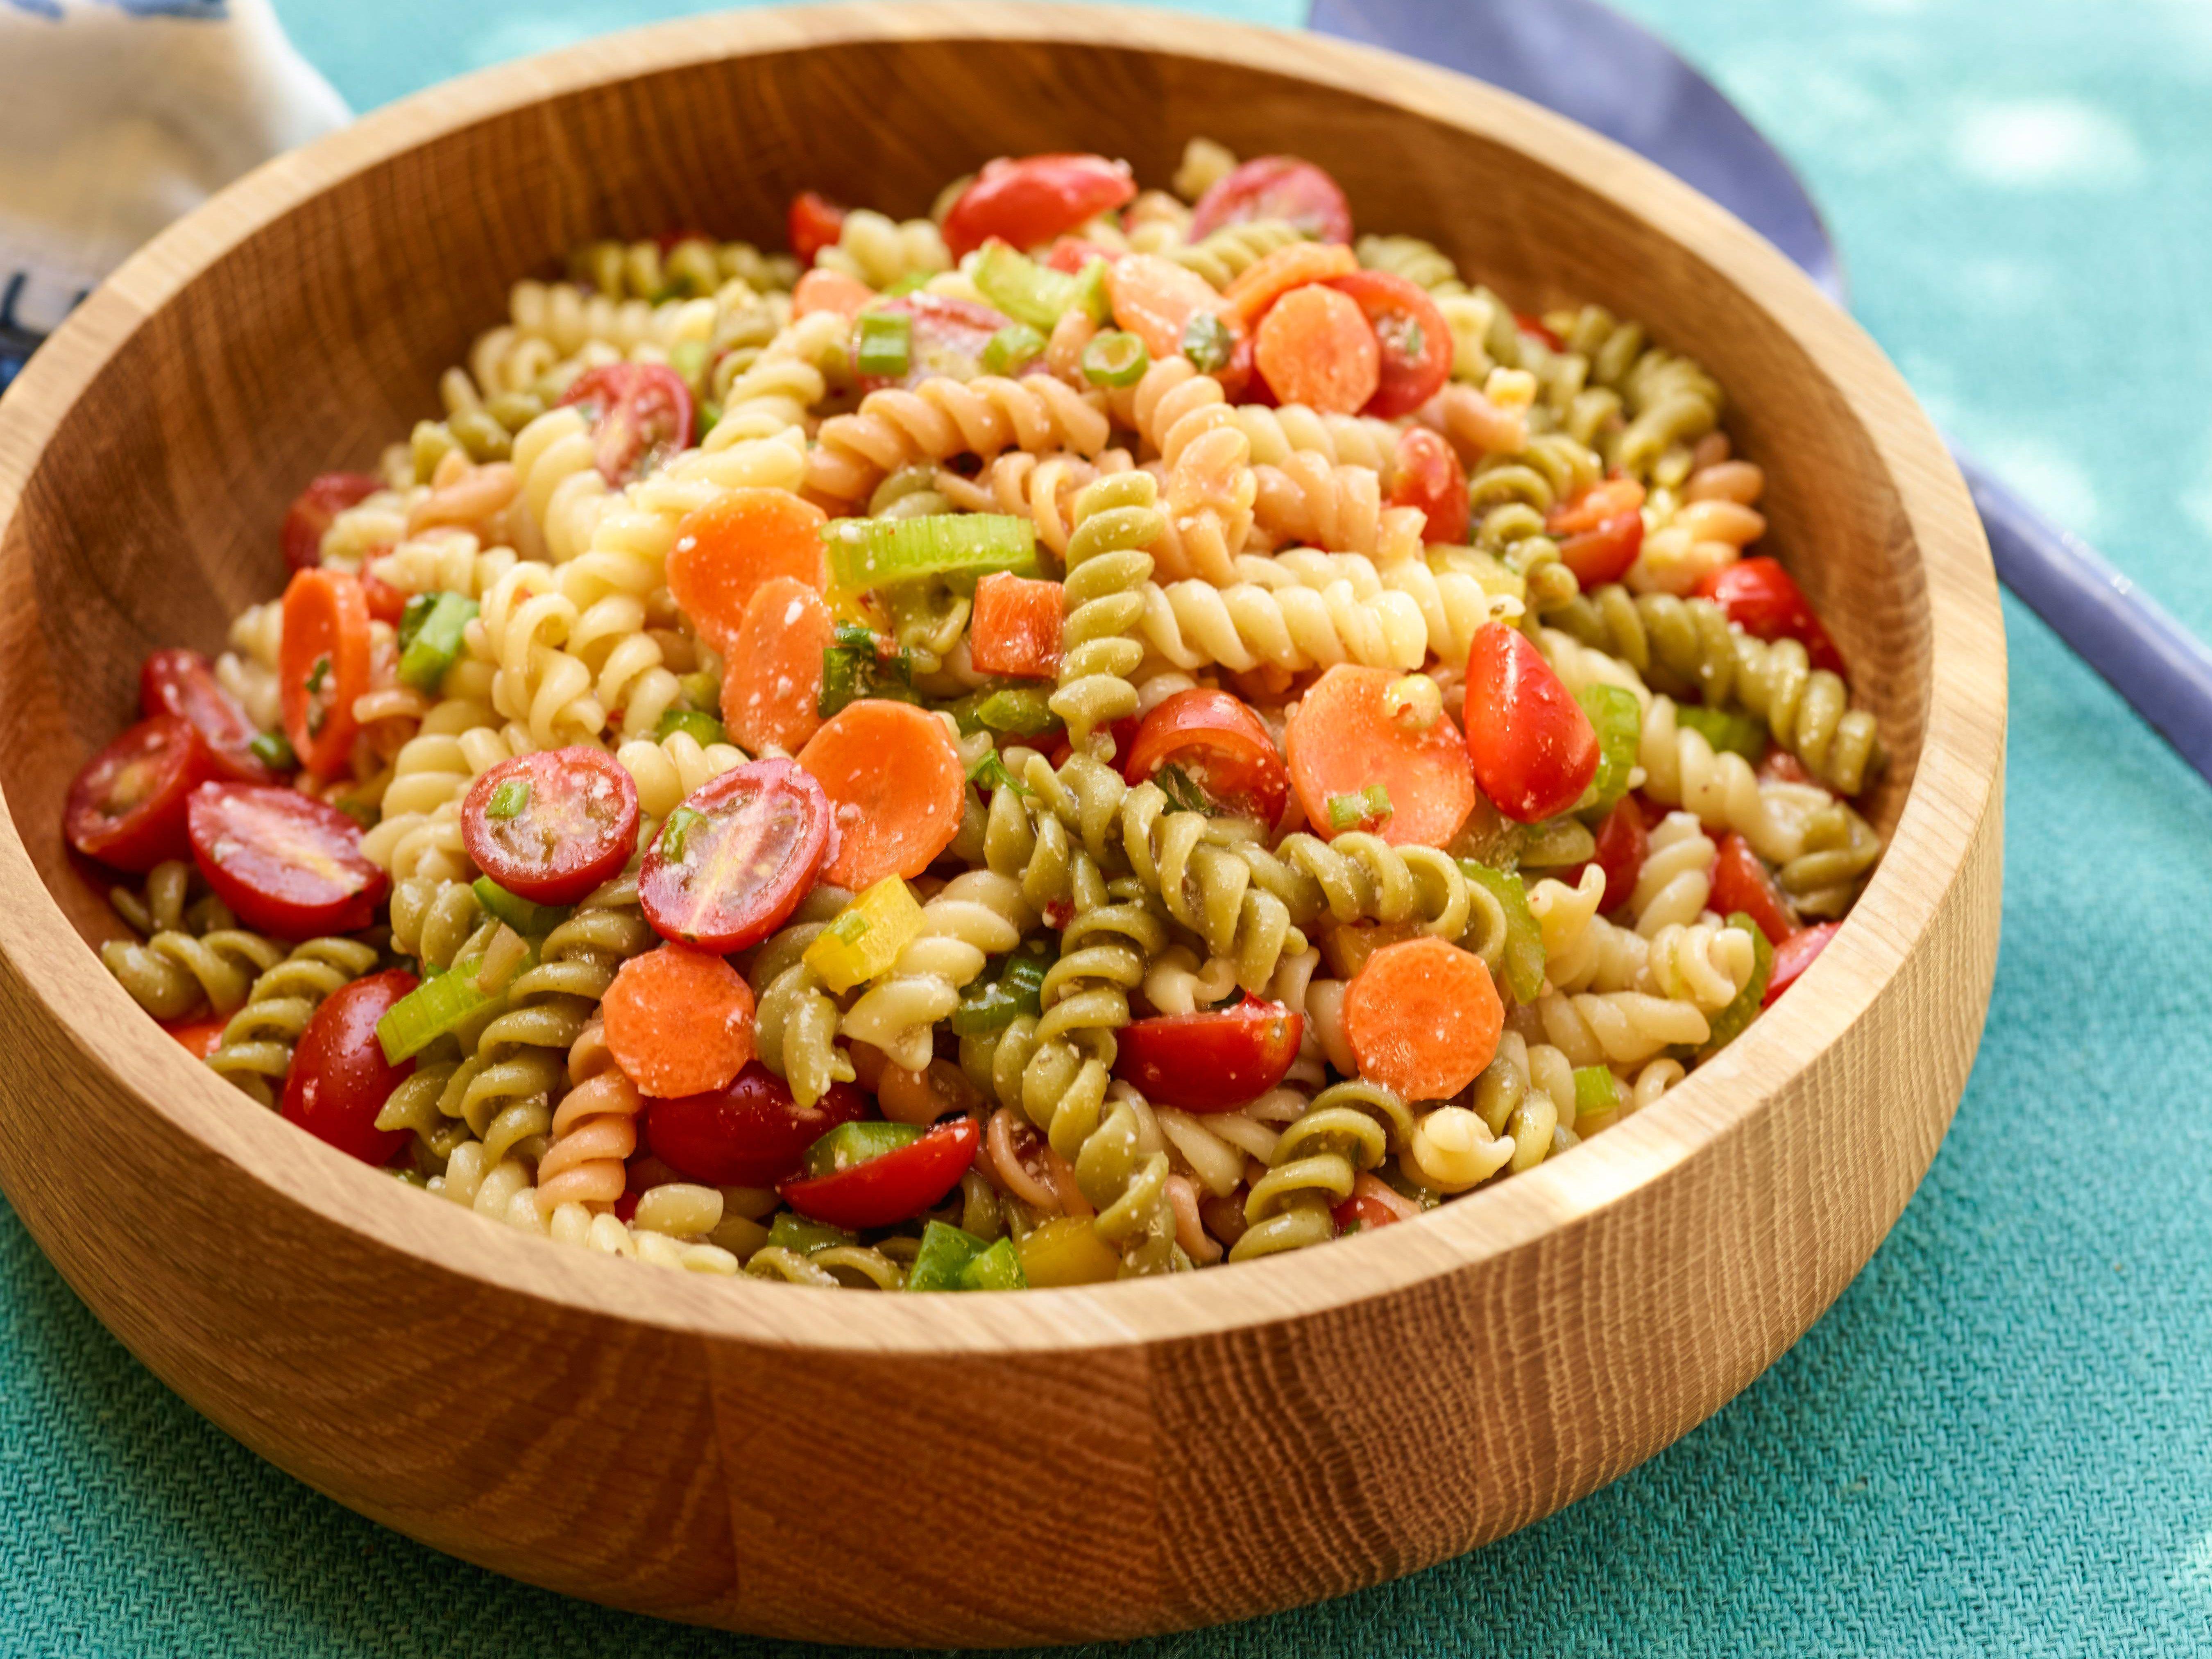 Garden pasta salad recipe pasta salad pasta and salad forumfinder Choice Image